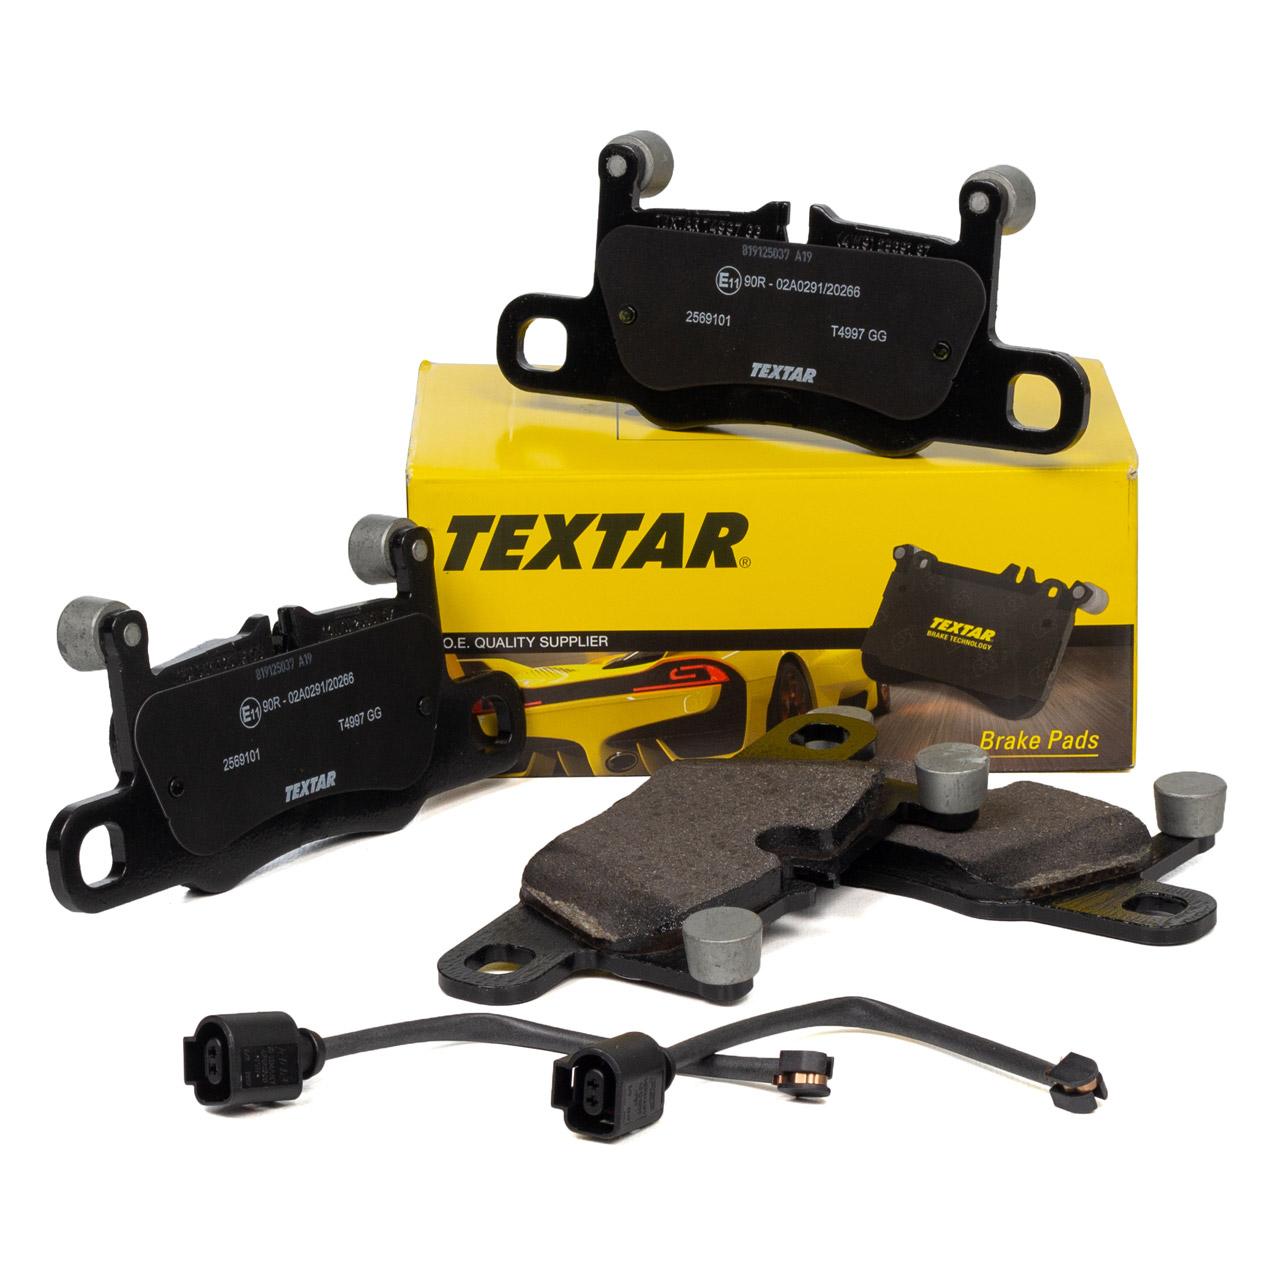 TEXTAR 2569101 Bremsbeläge + Wako PORSCHE 991 3.0/3.4/3.8 Carrera / S / GTS hinten